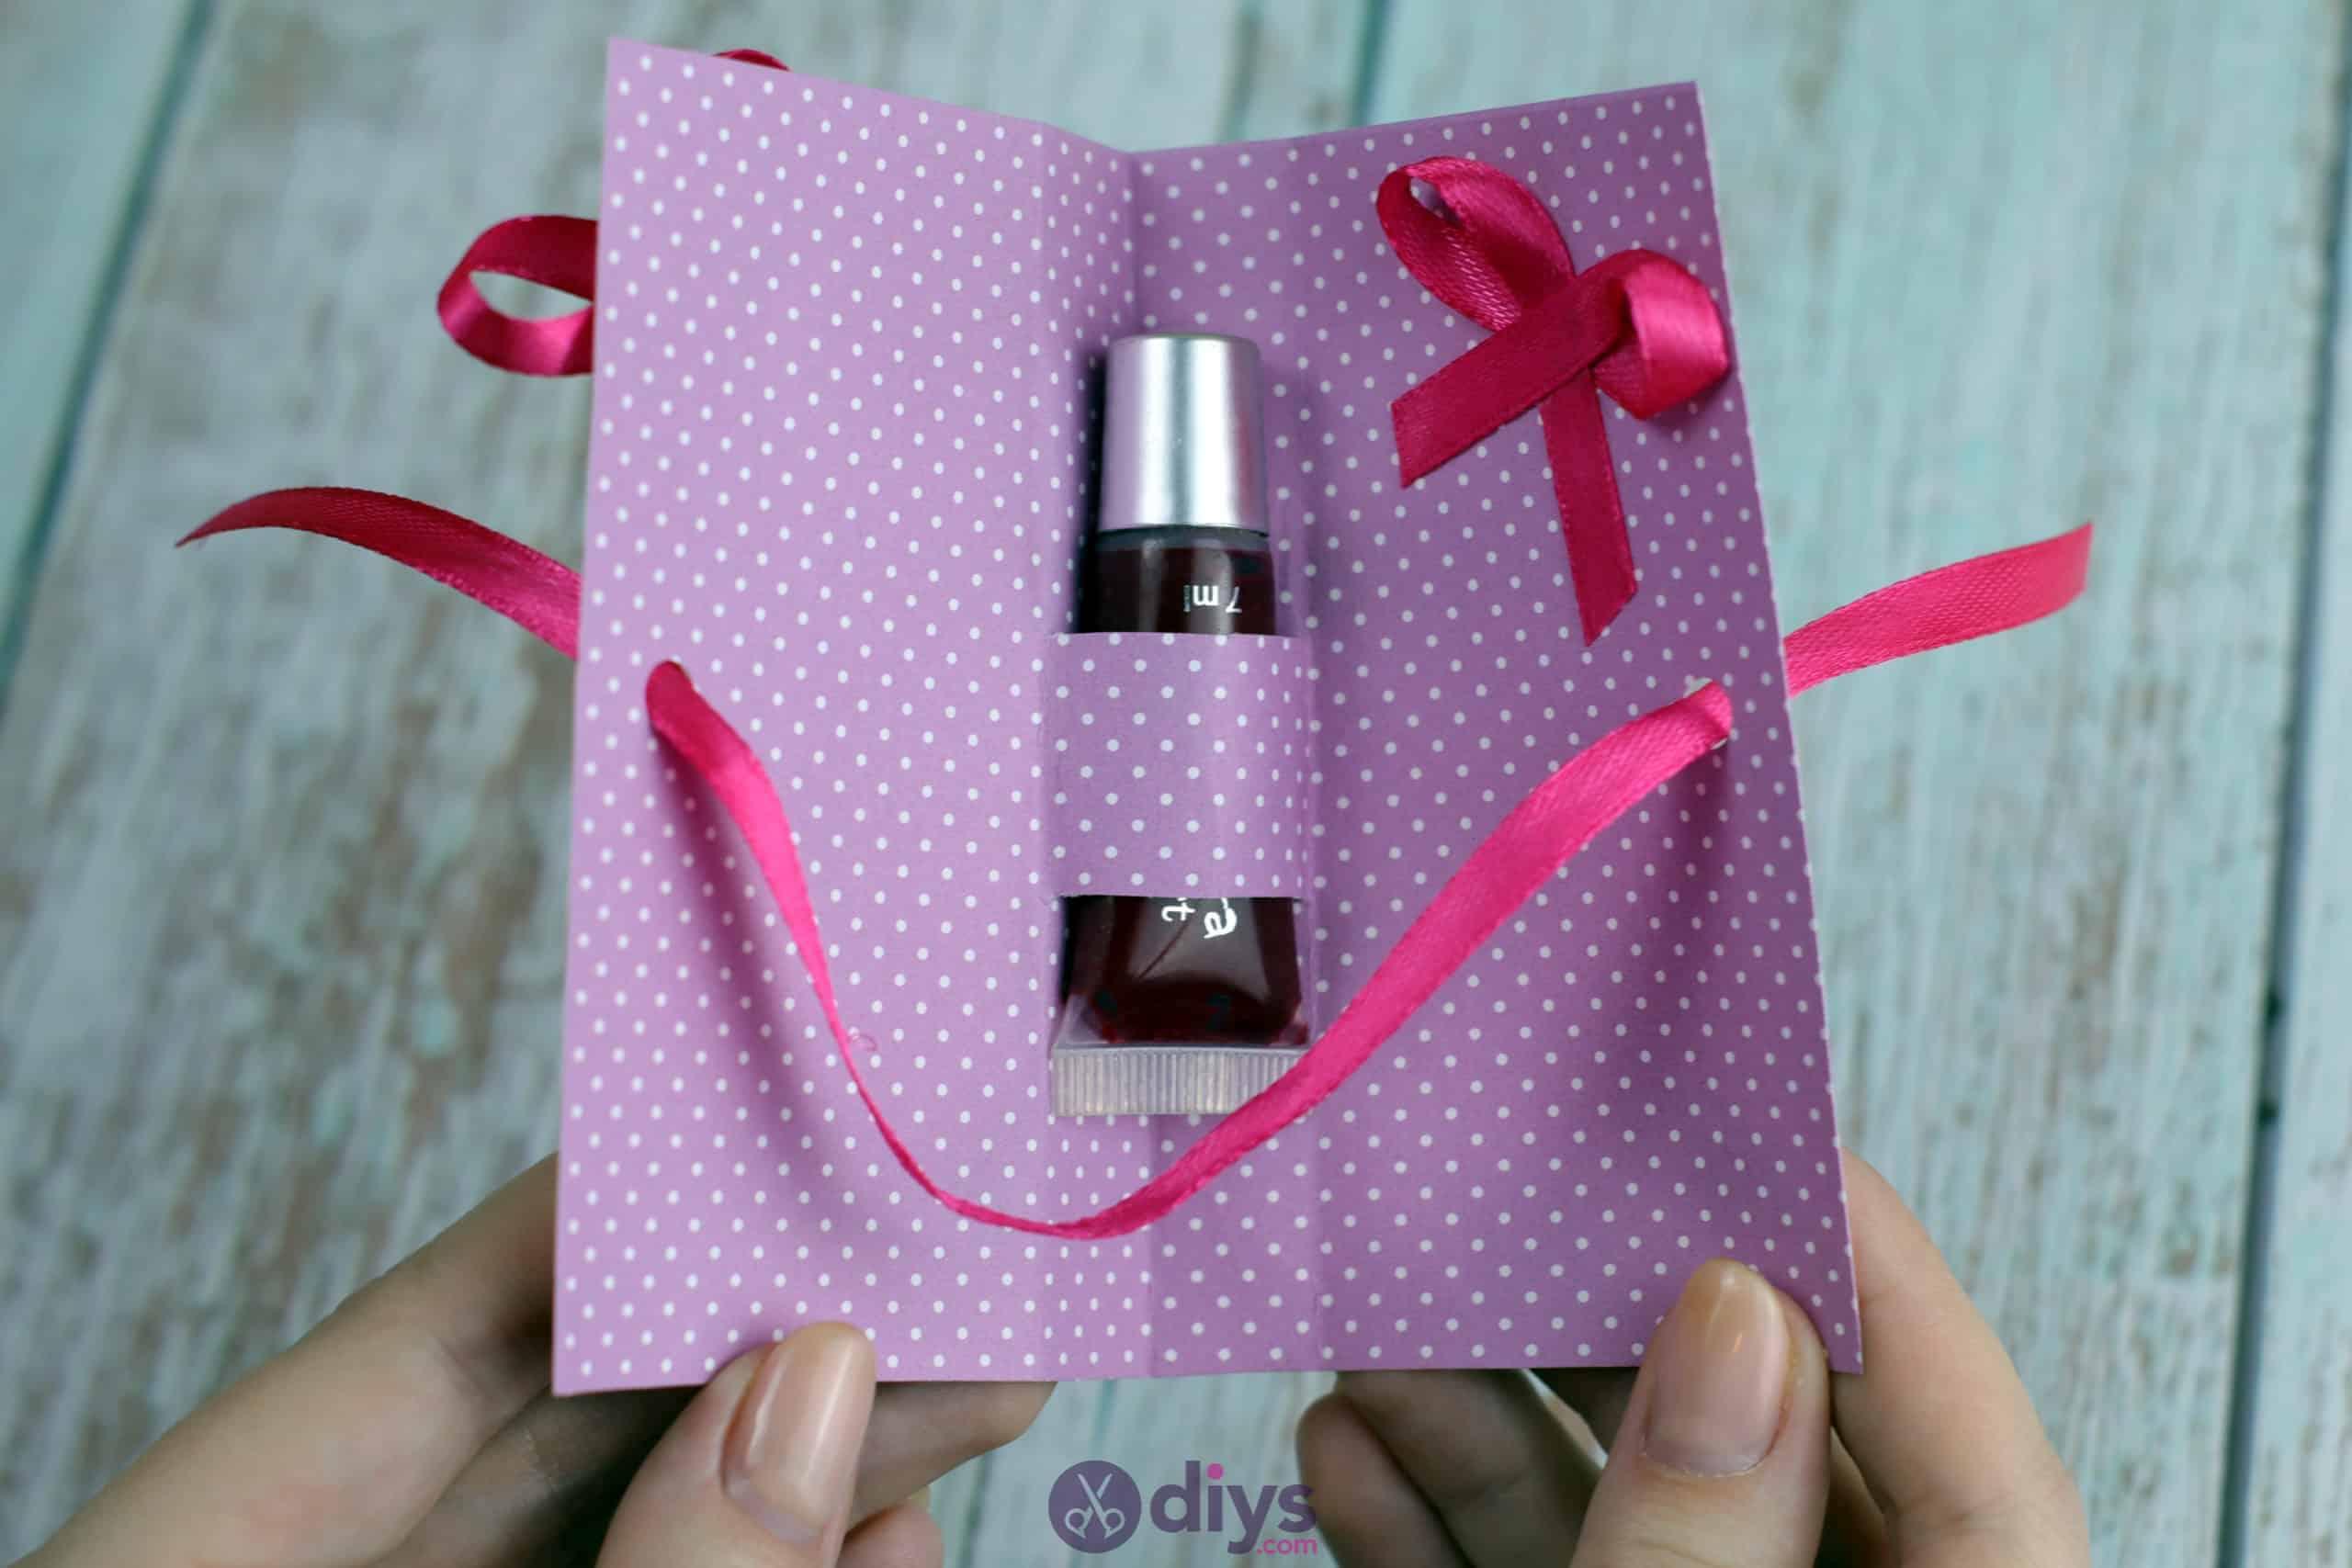 Diy lipstick gift card ribbon